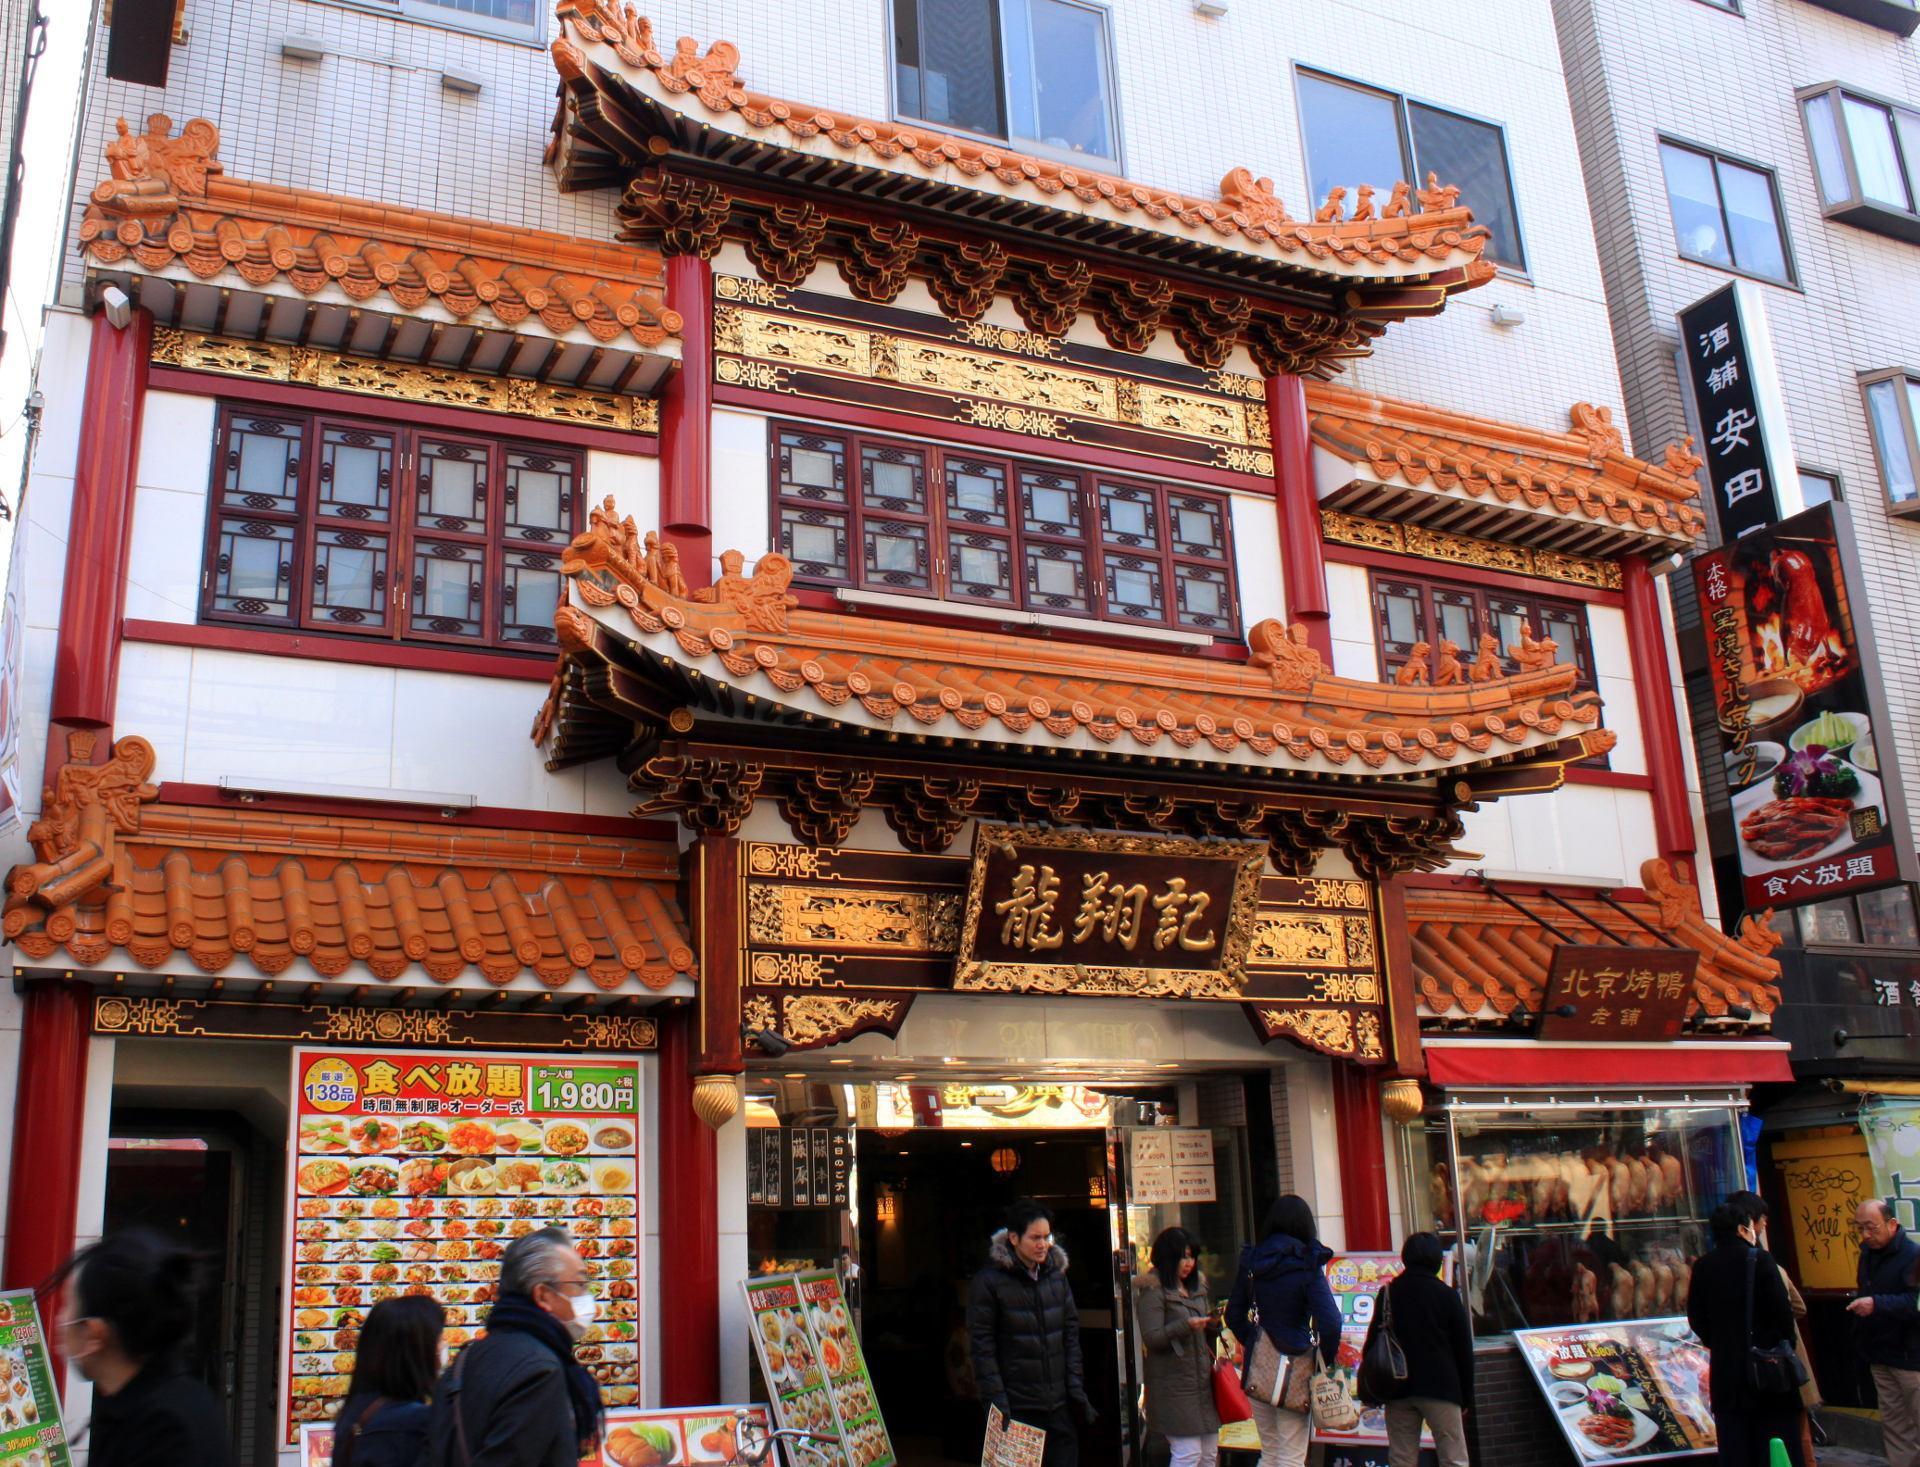 yokohama chinatown chinska dzielnica ulica iglawpodrozy